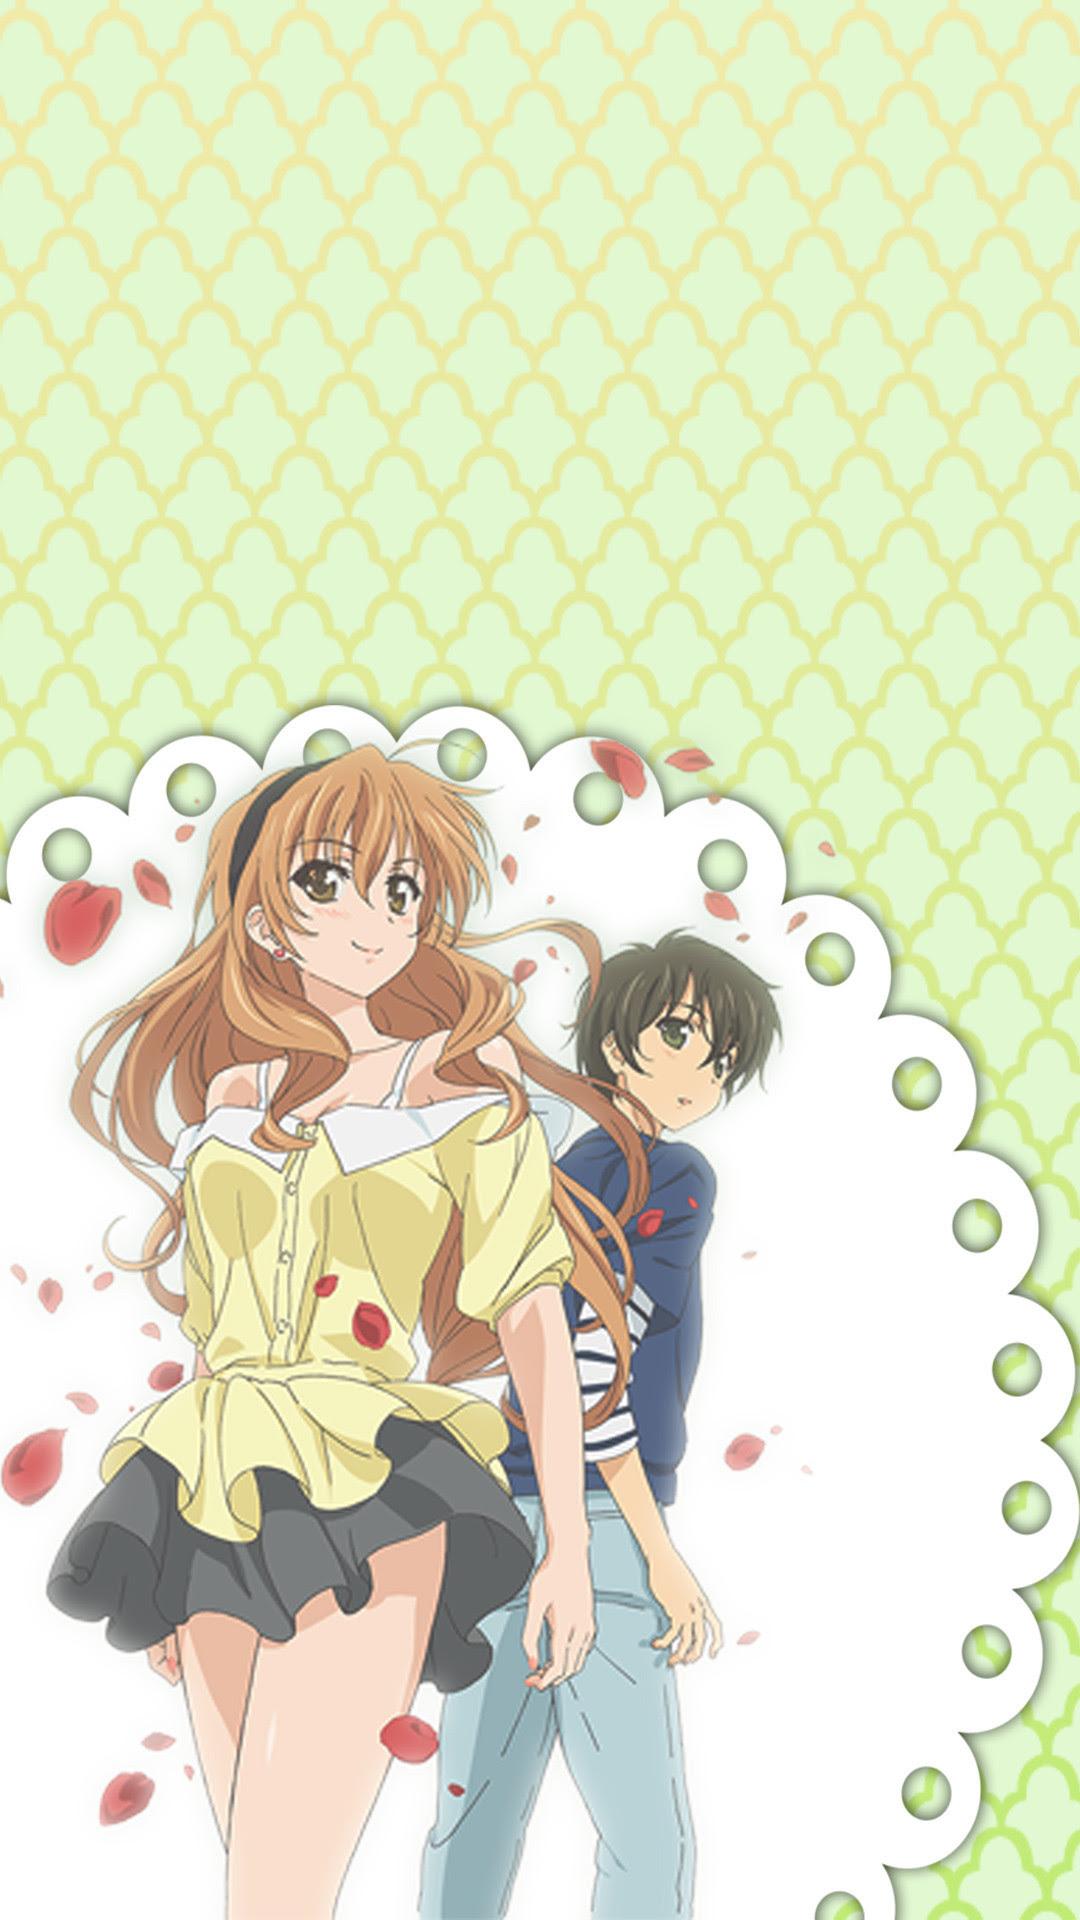 Lock Screen High Quality Cute Anime Girl Wallpaper Gambarku